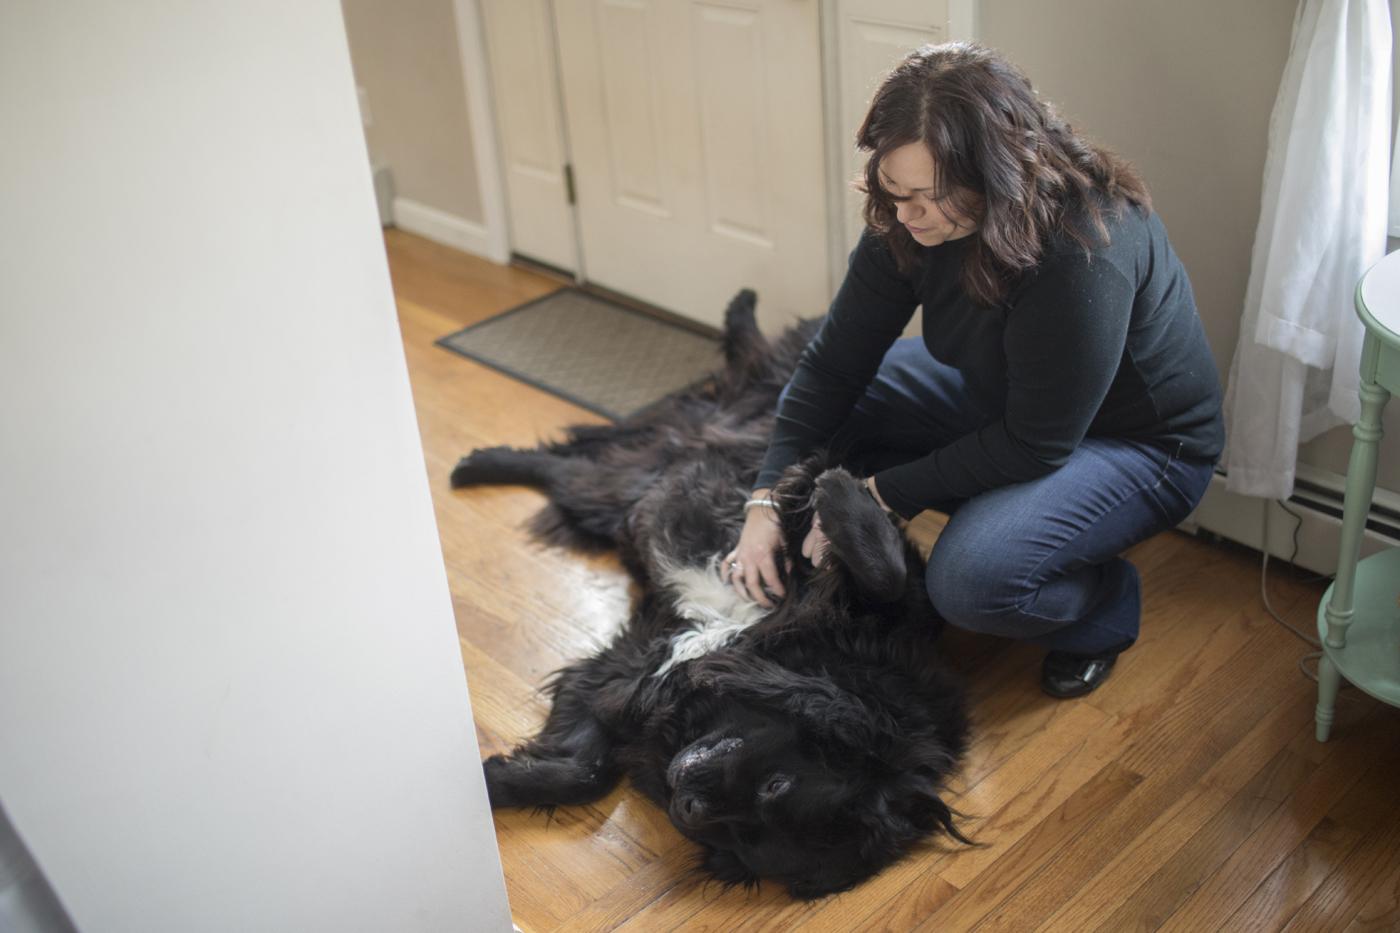 Violet's mom pets their dog